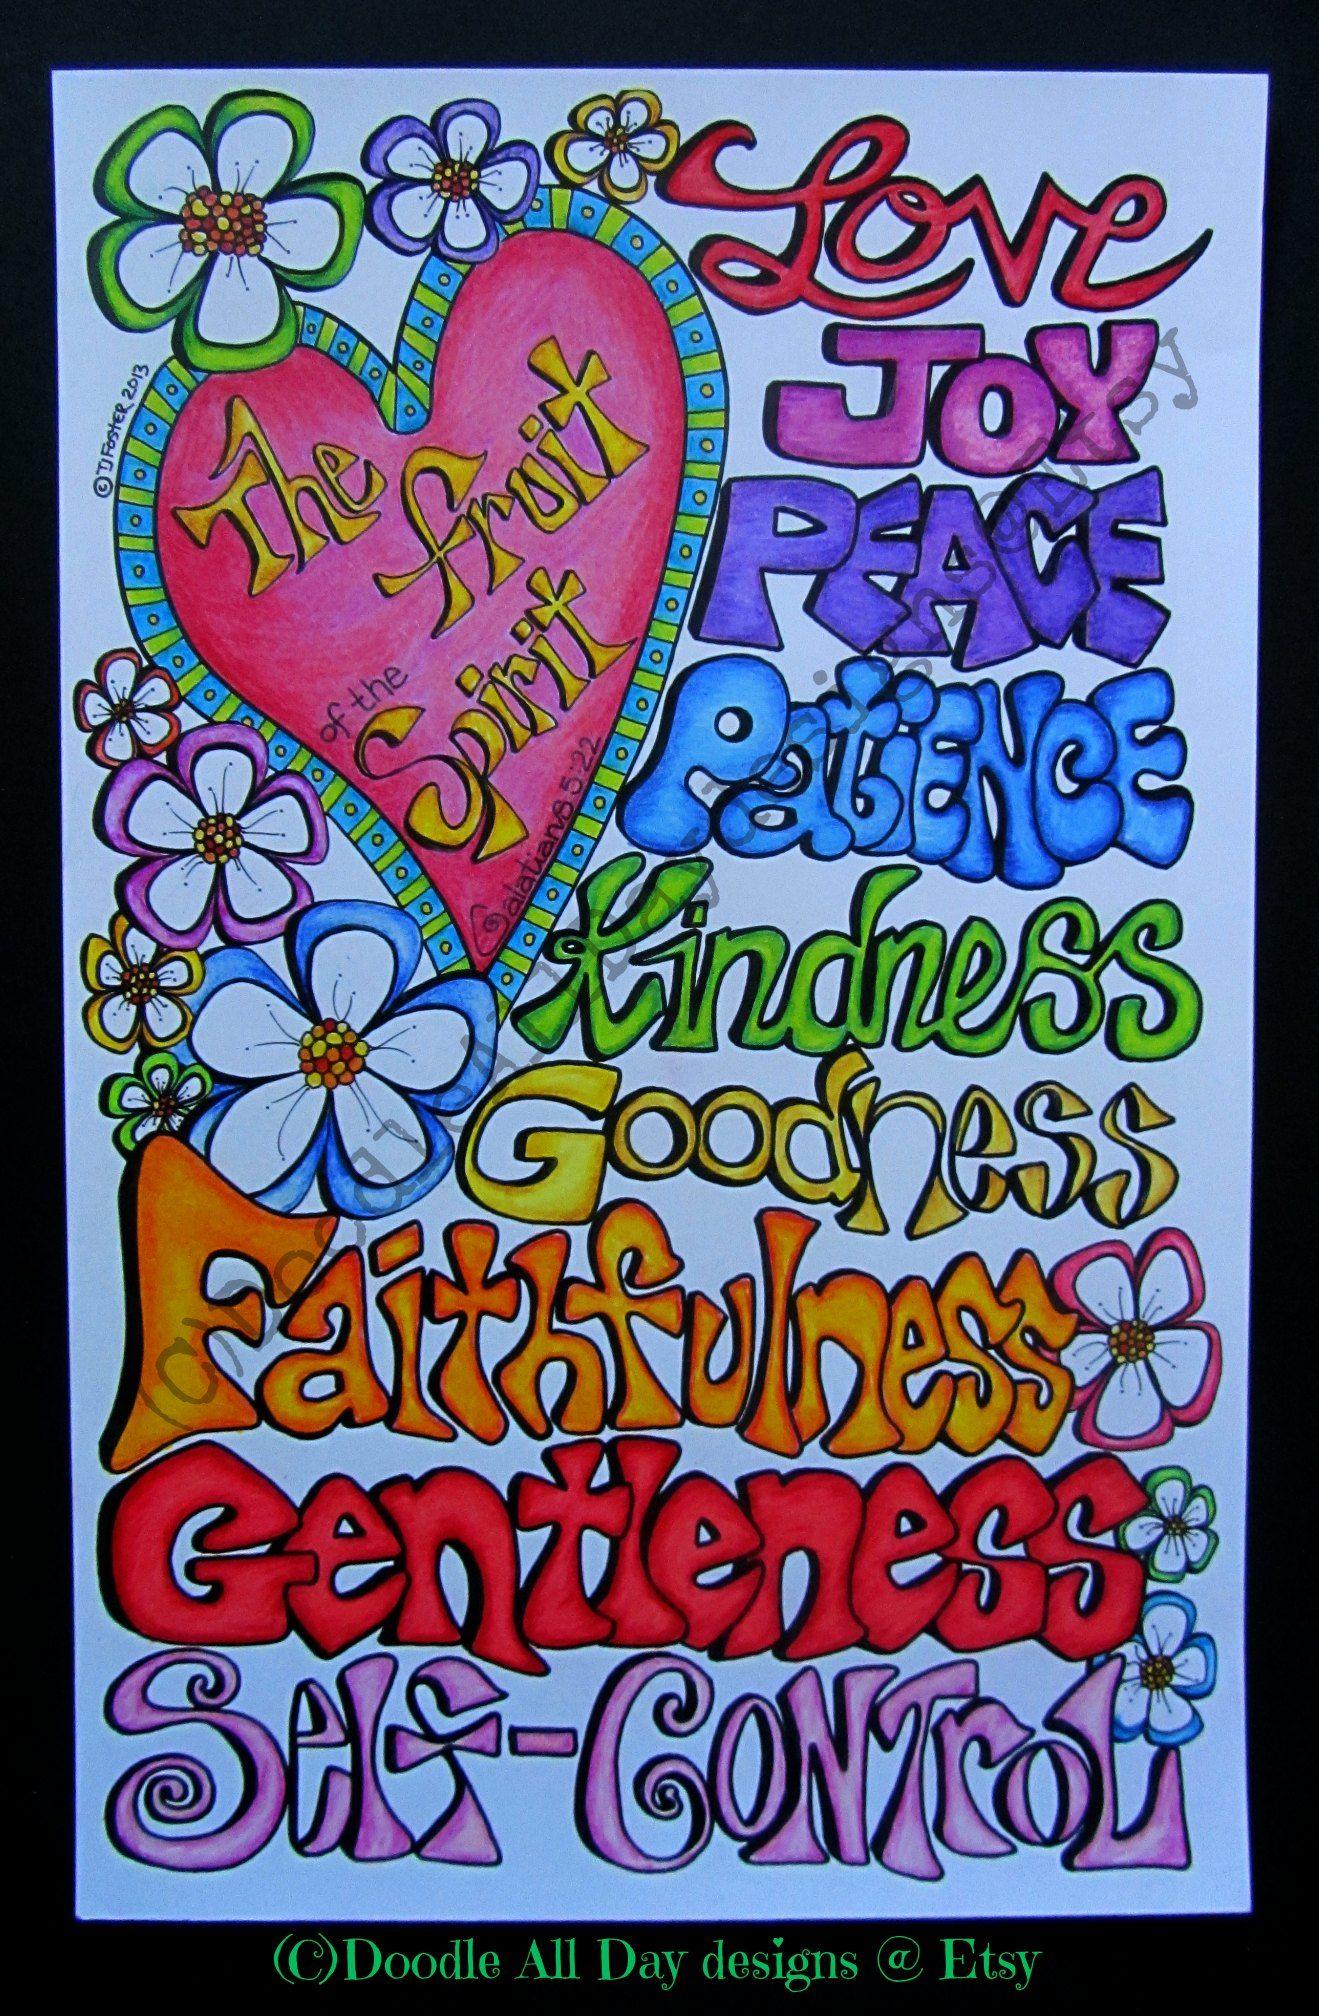 The Fruit Of The Spirit Is Love Joy Peace Patience Kindness Goodness Faithfulness